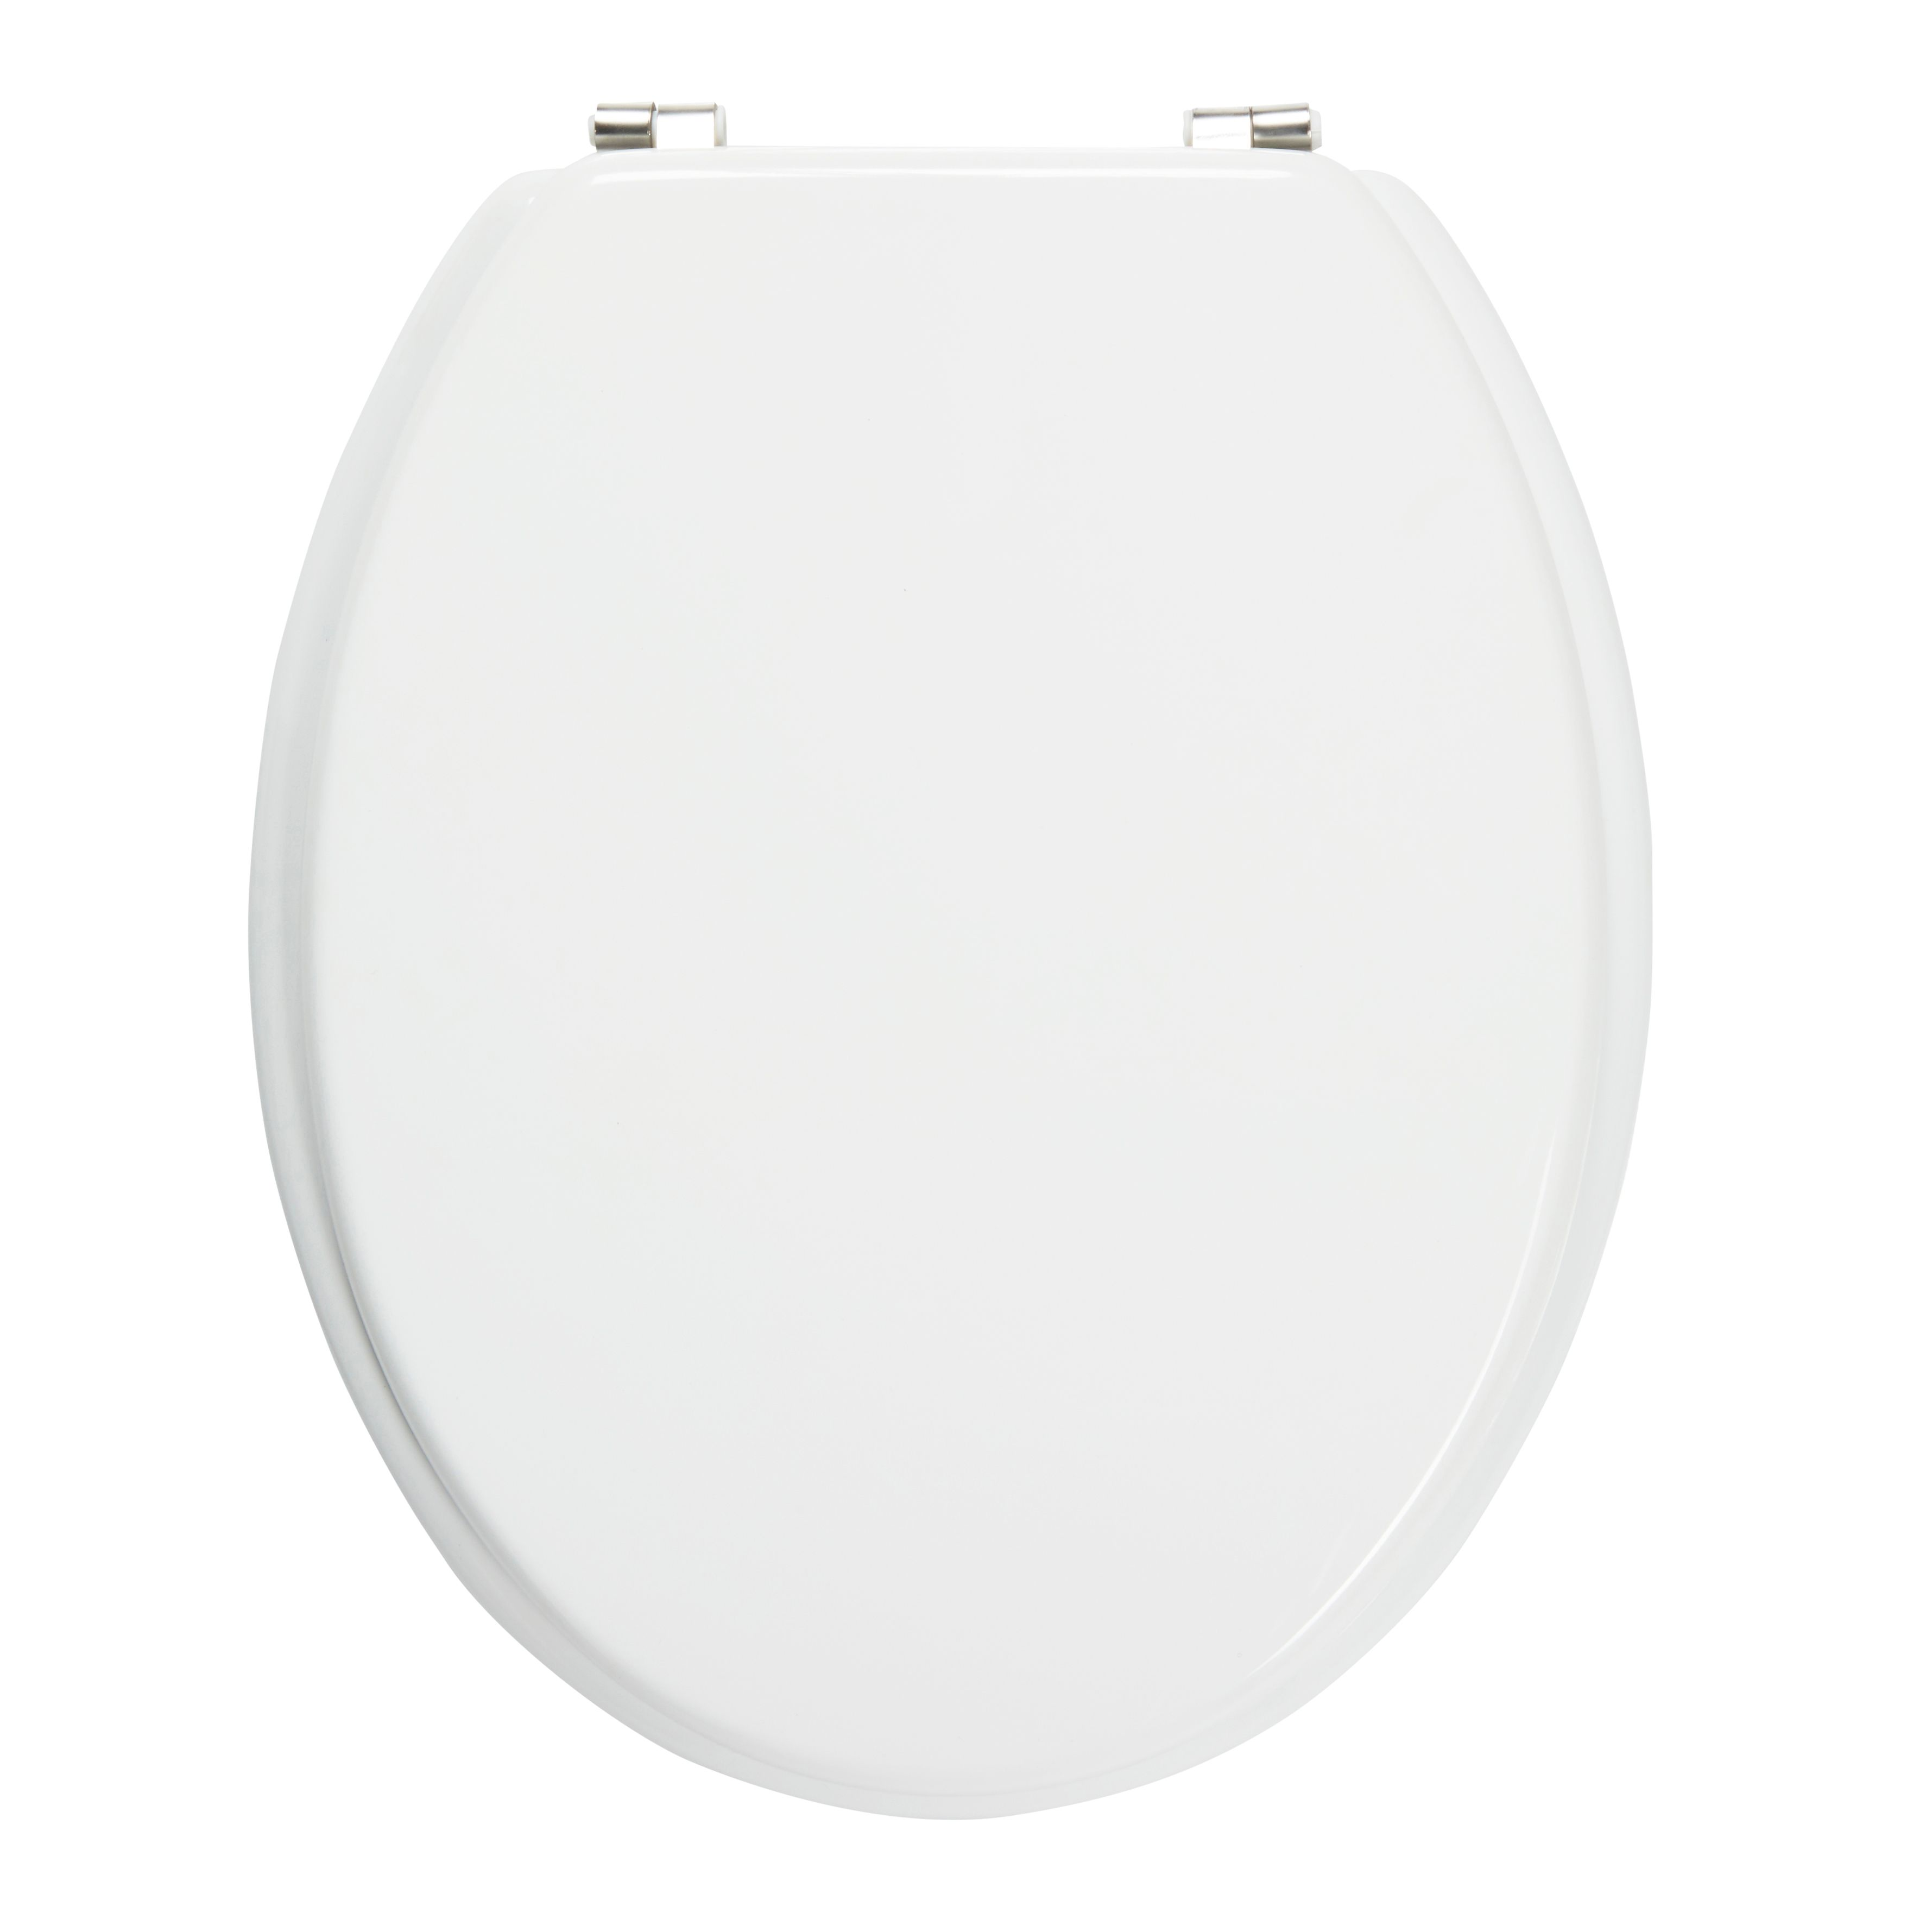 Cooke Lewis Palmi White Standard Close Toilet Seat